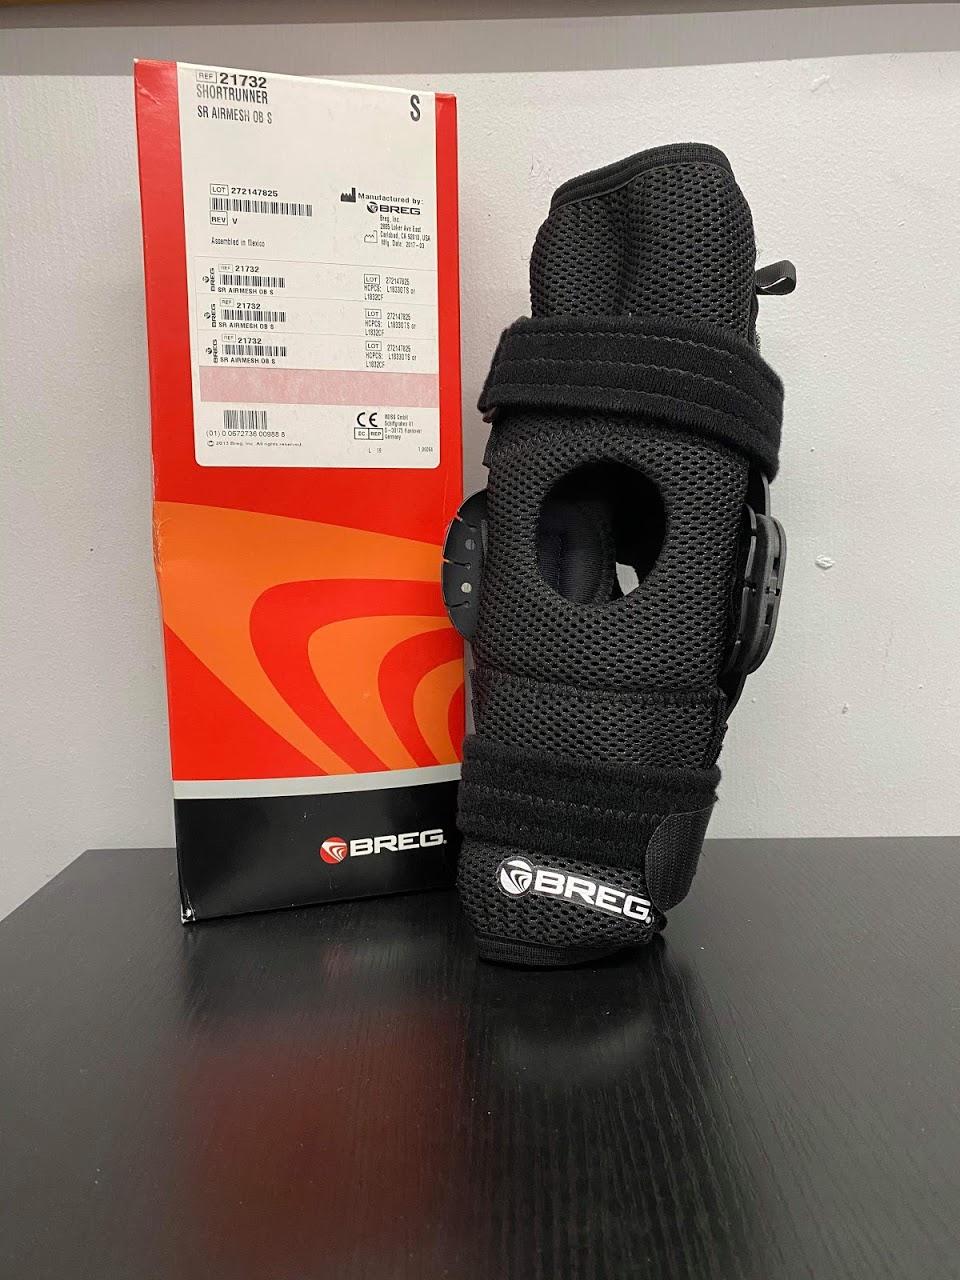 brace used to stabilize knee injury